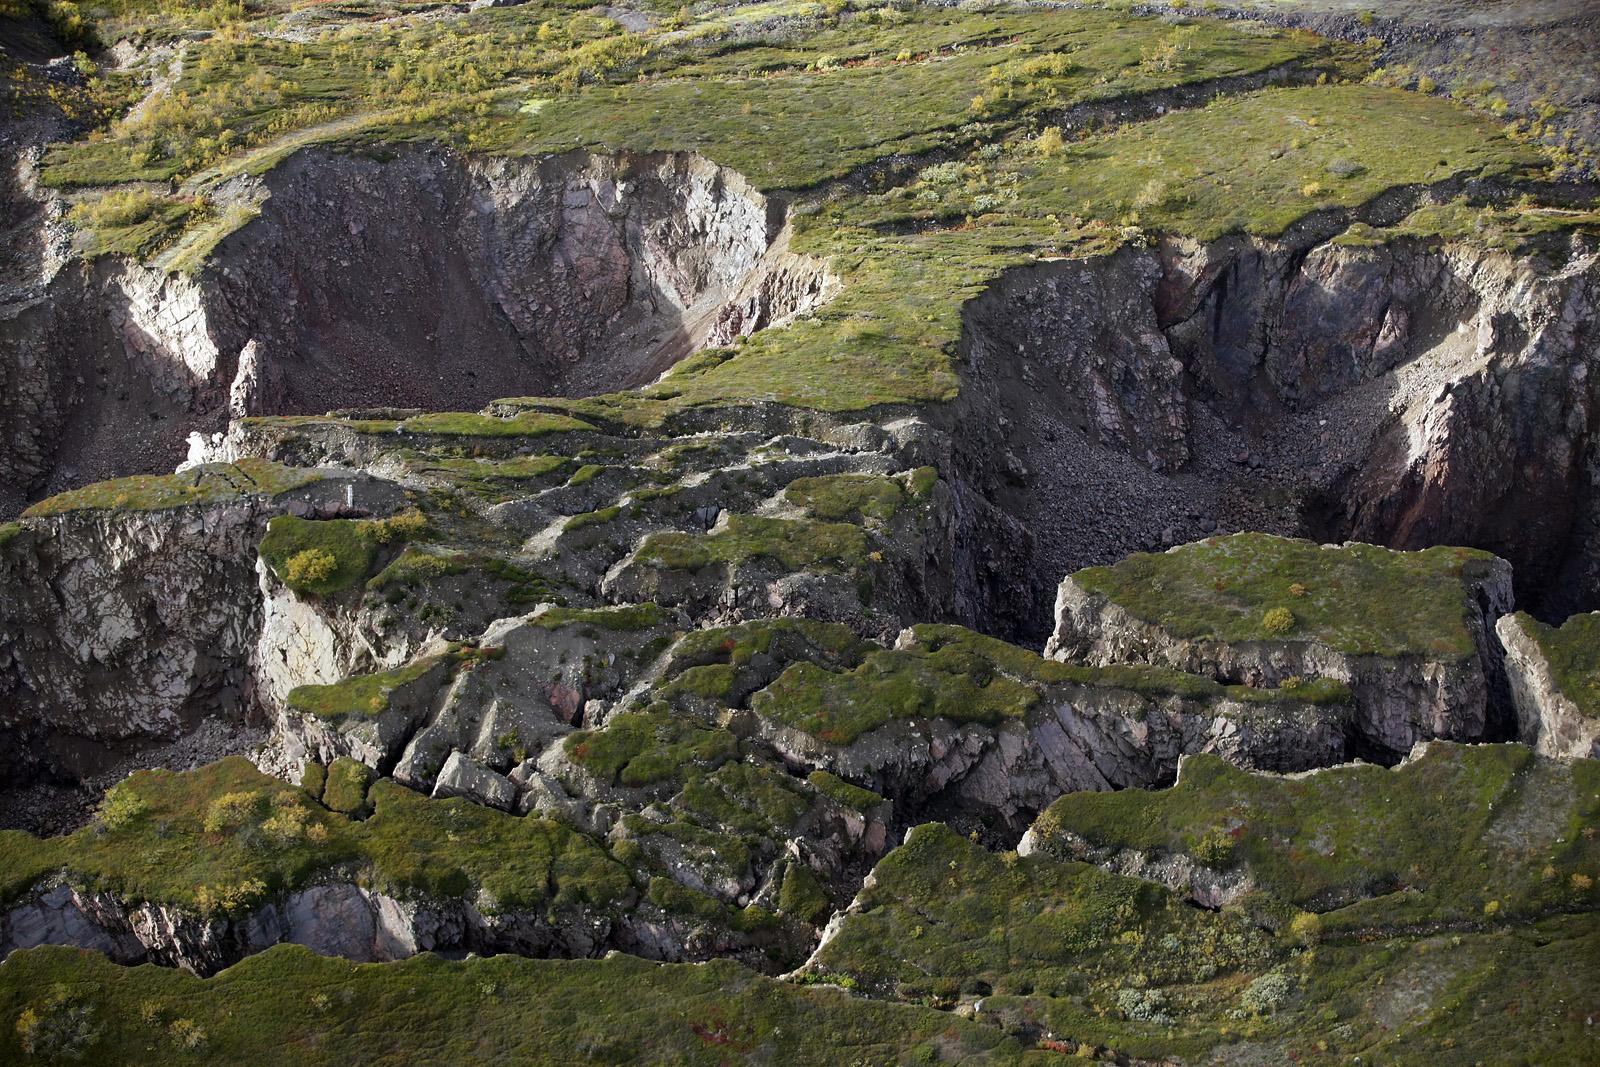 Disintegrating Tundra